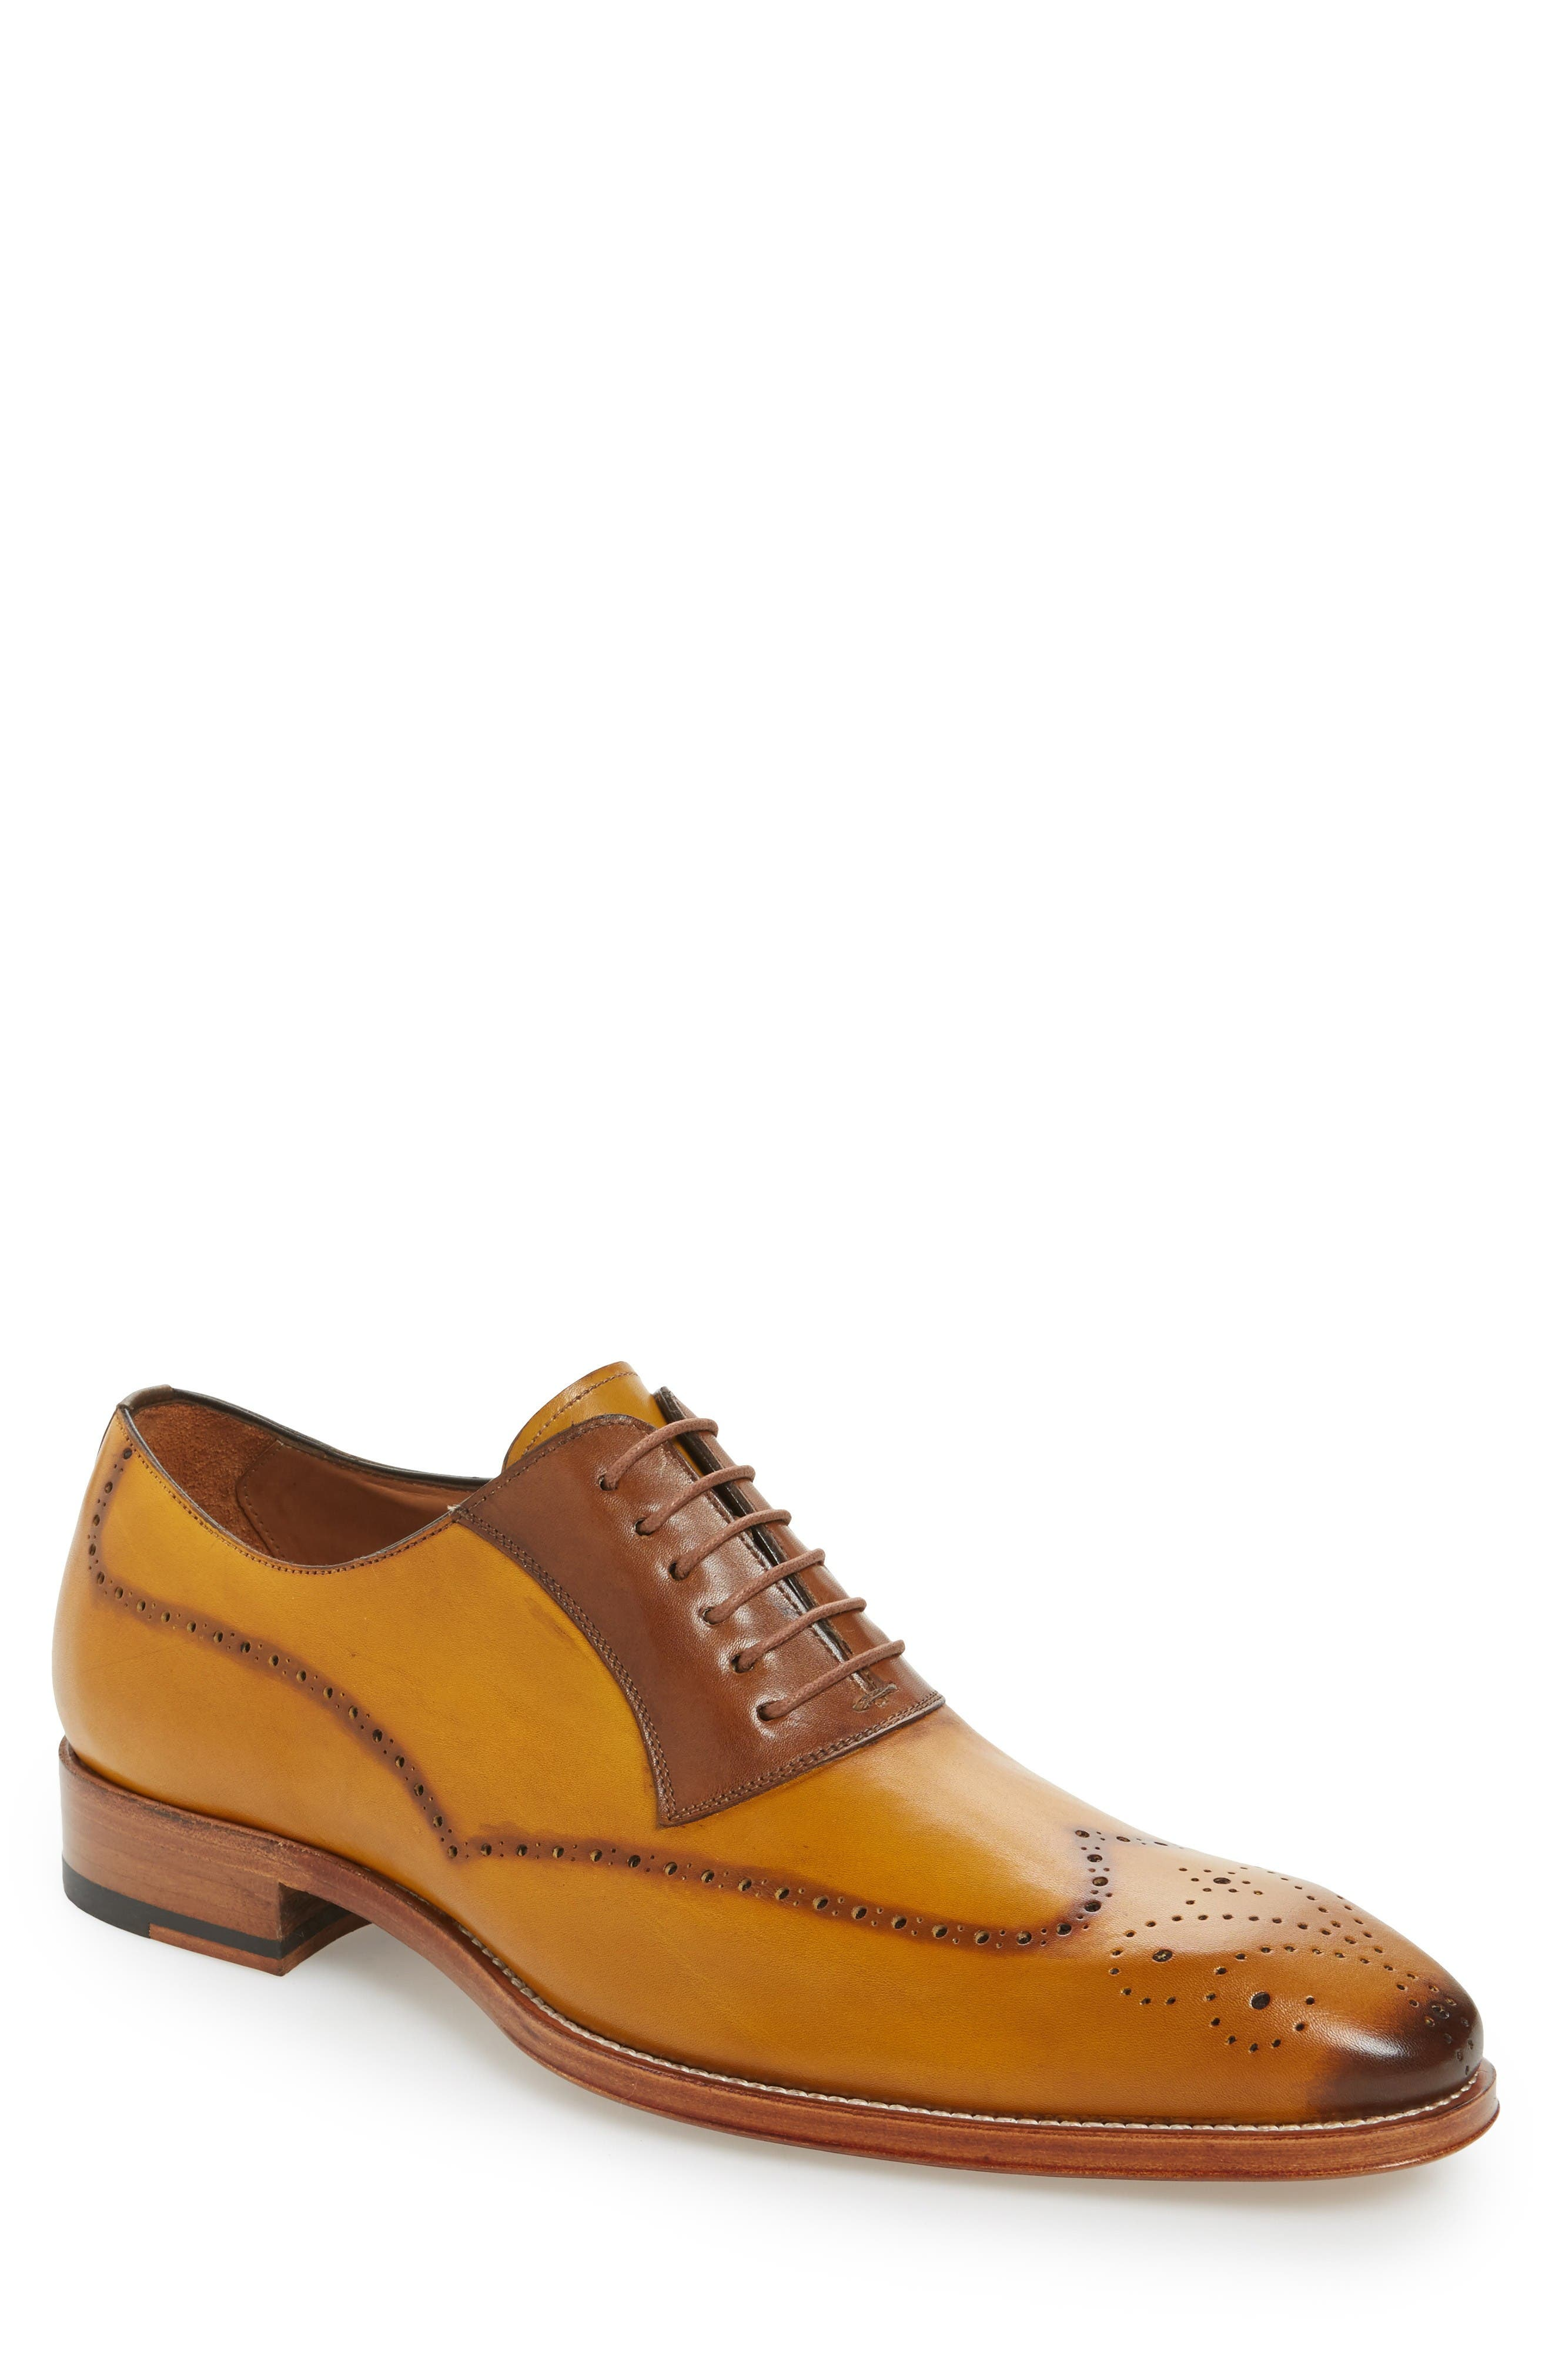 Kelvin Faux Wingtip,                             Main thumbnail 1, color,                             Mustard/ Tan Leather